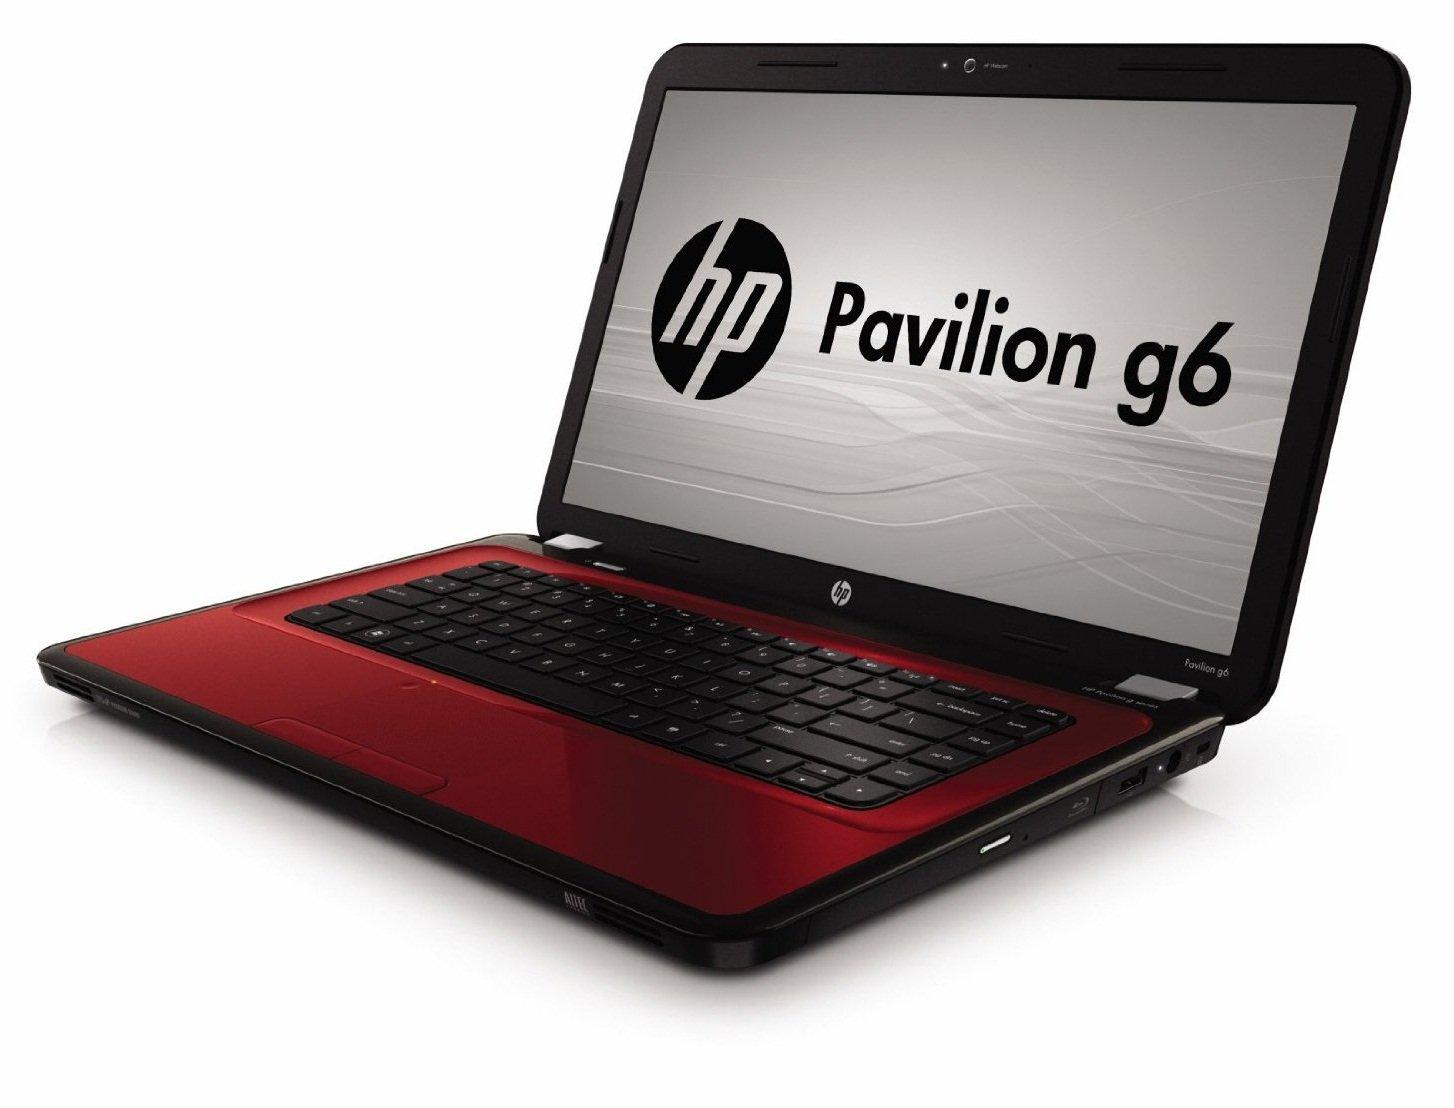 HP Pavilion g6-1110ss Rojo Portátil 39,6 cm (15.6